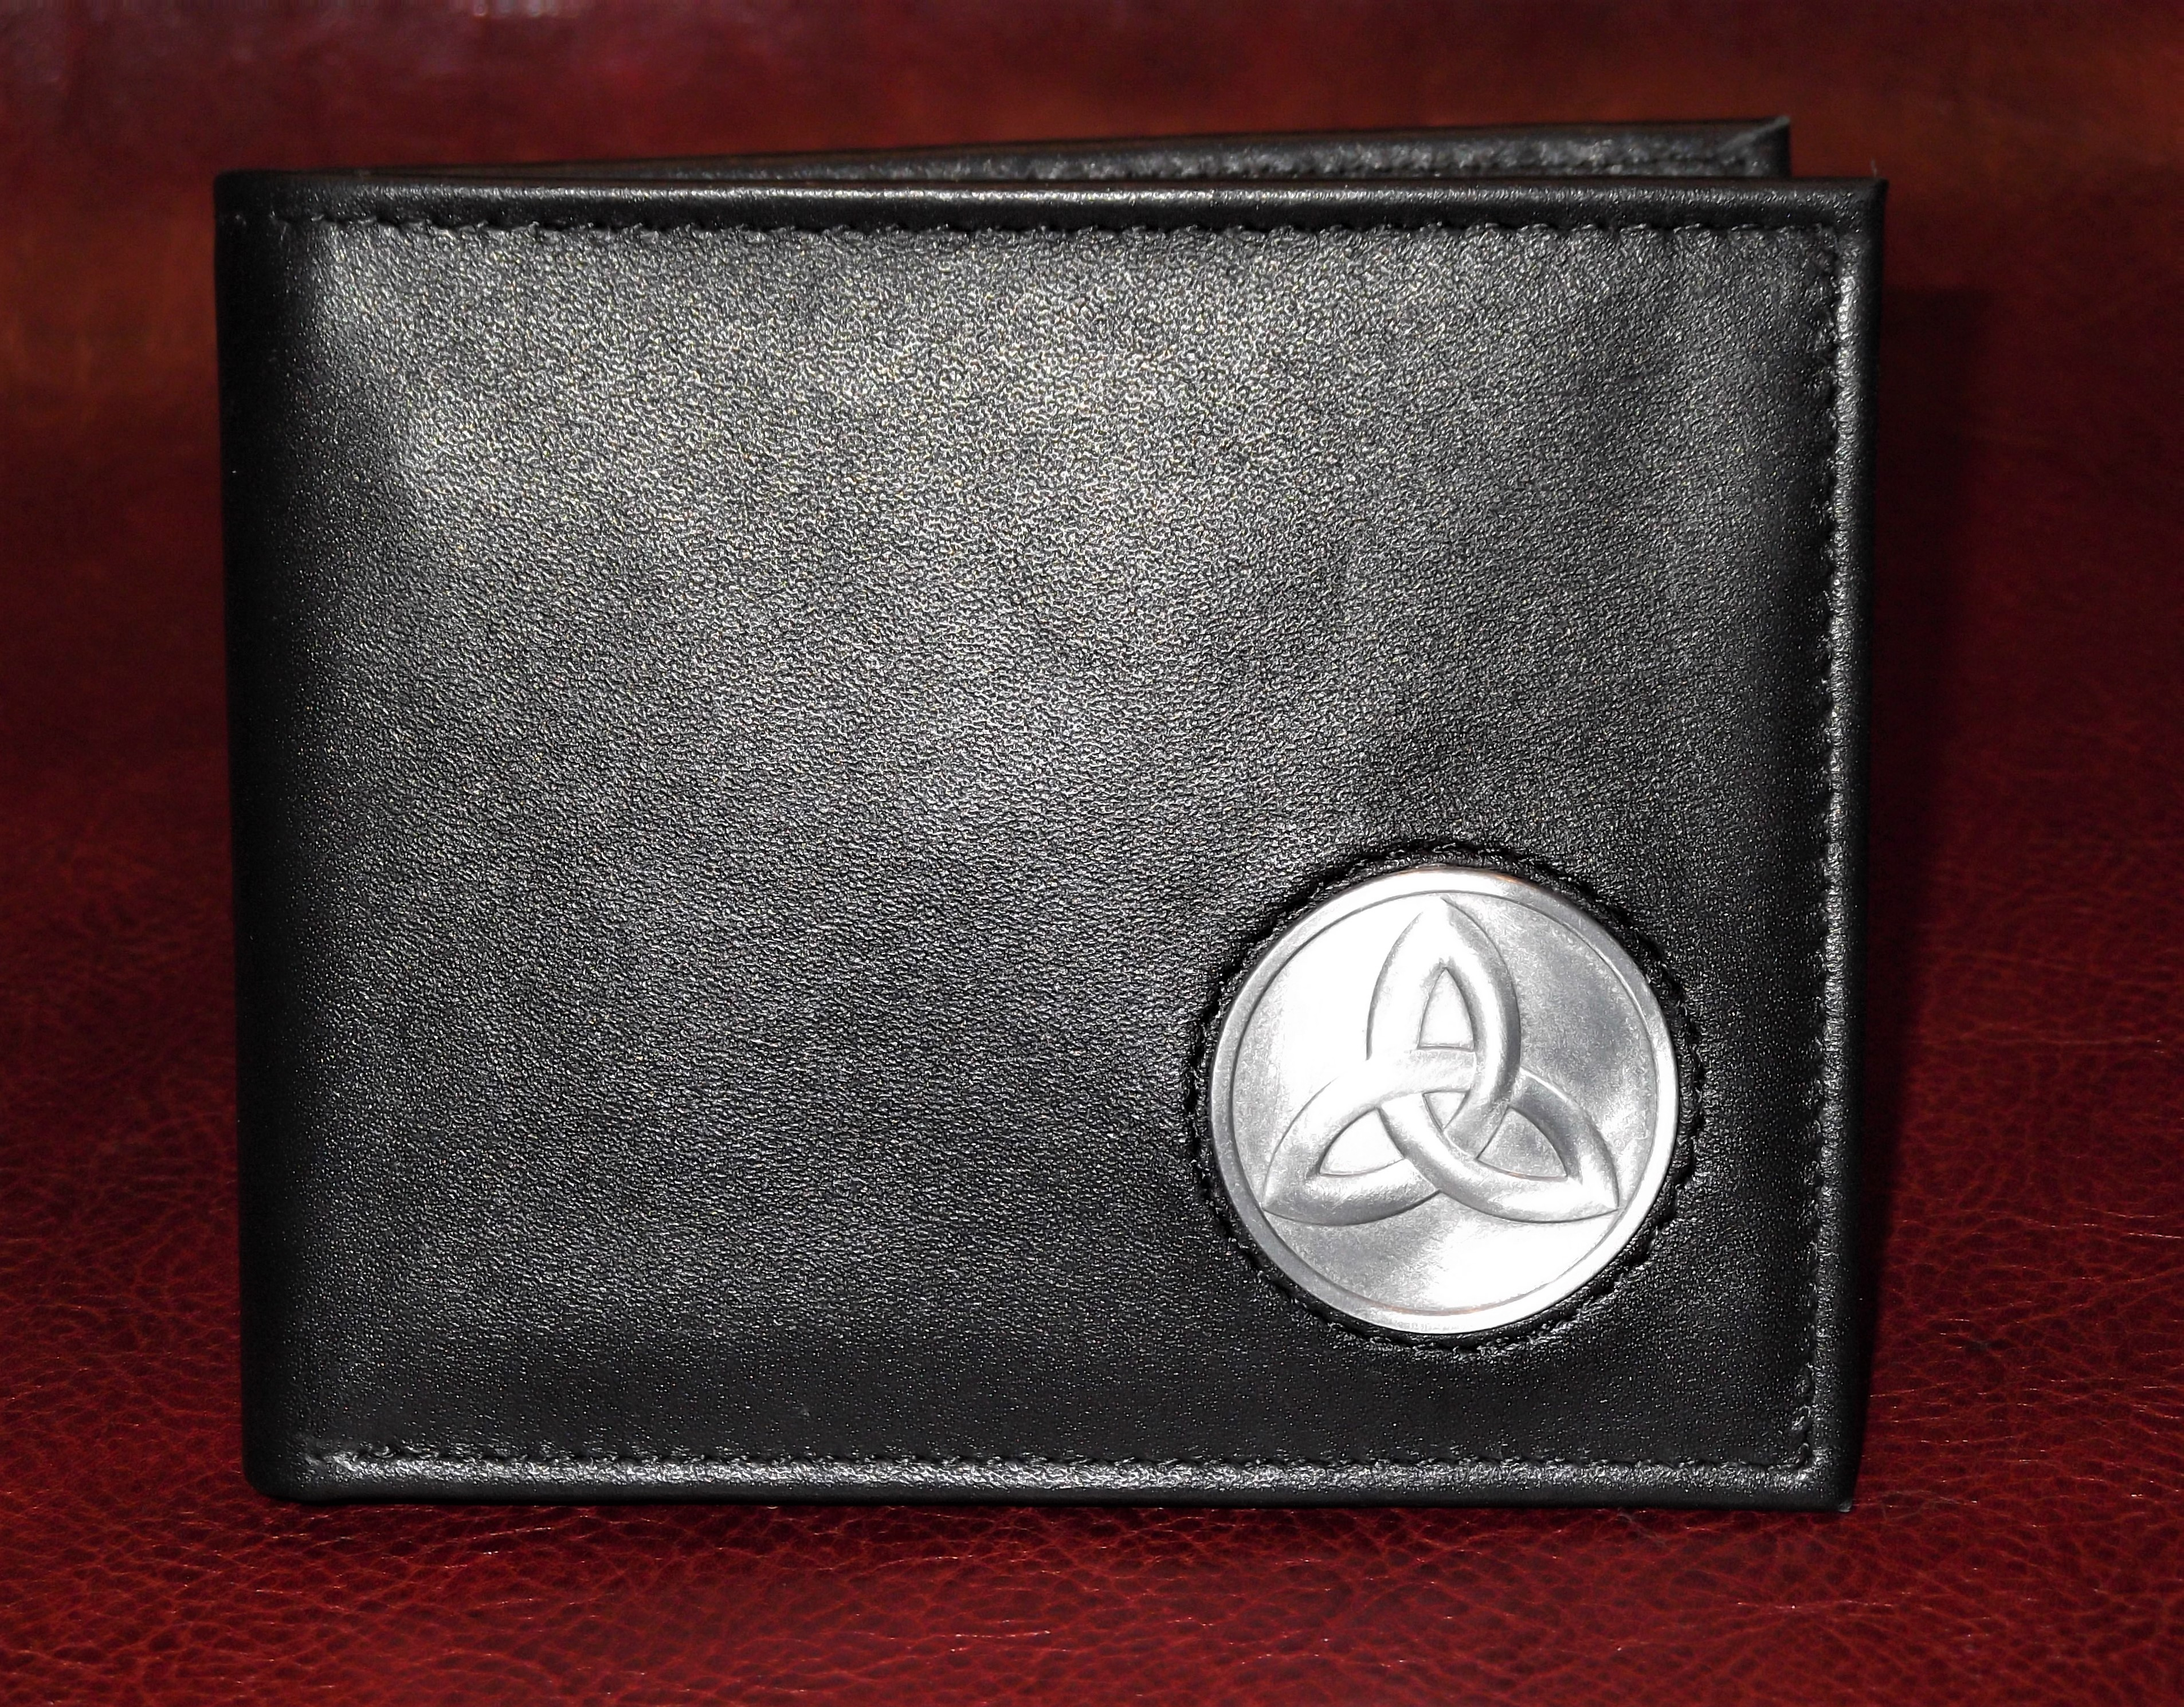 Celtic Ireland Irish Black Leather Billfold Wallet with Trinity knot emblem